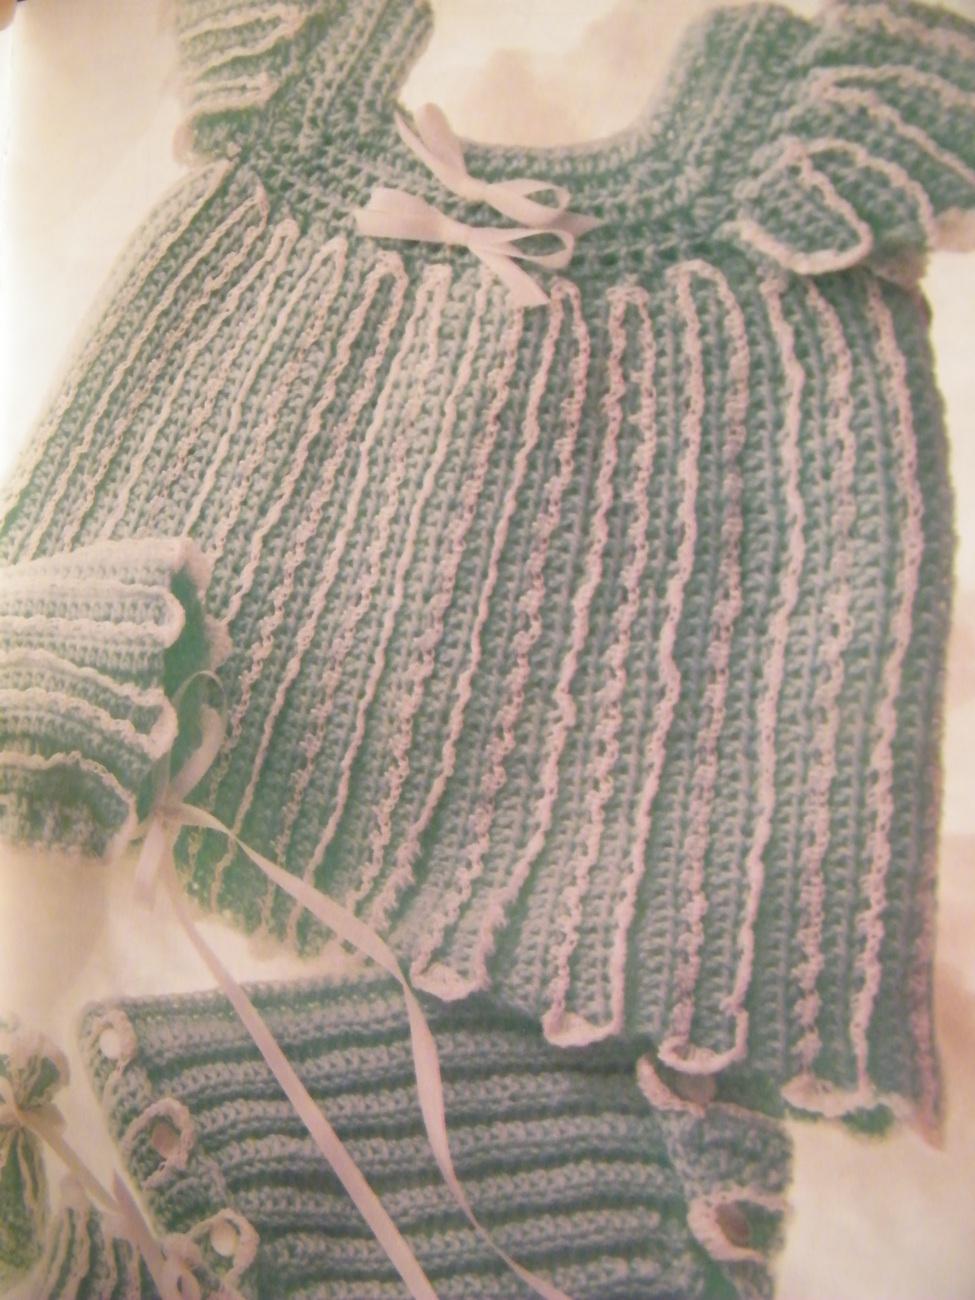 GIRL'S RUFFLED DRESS CROCHET PATTERN 1987 ANNIES ATTIC